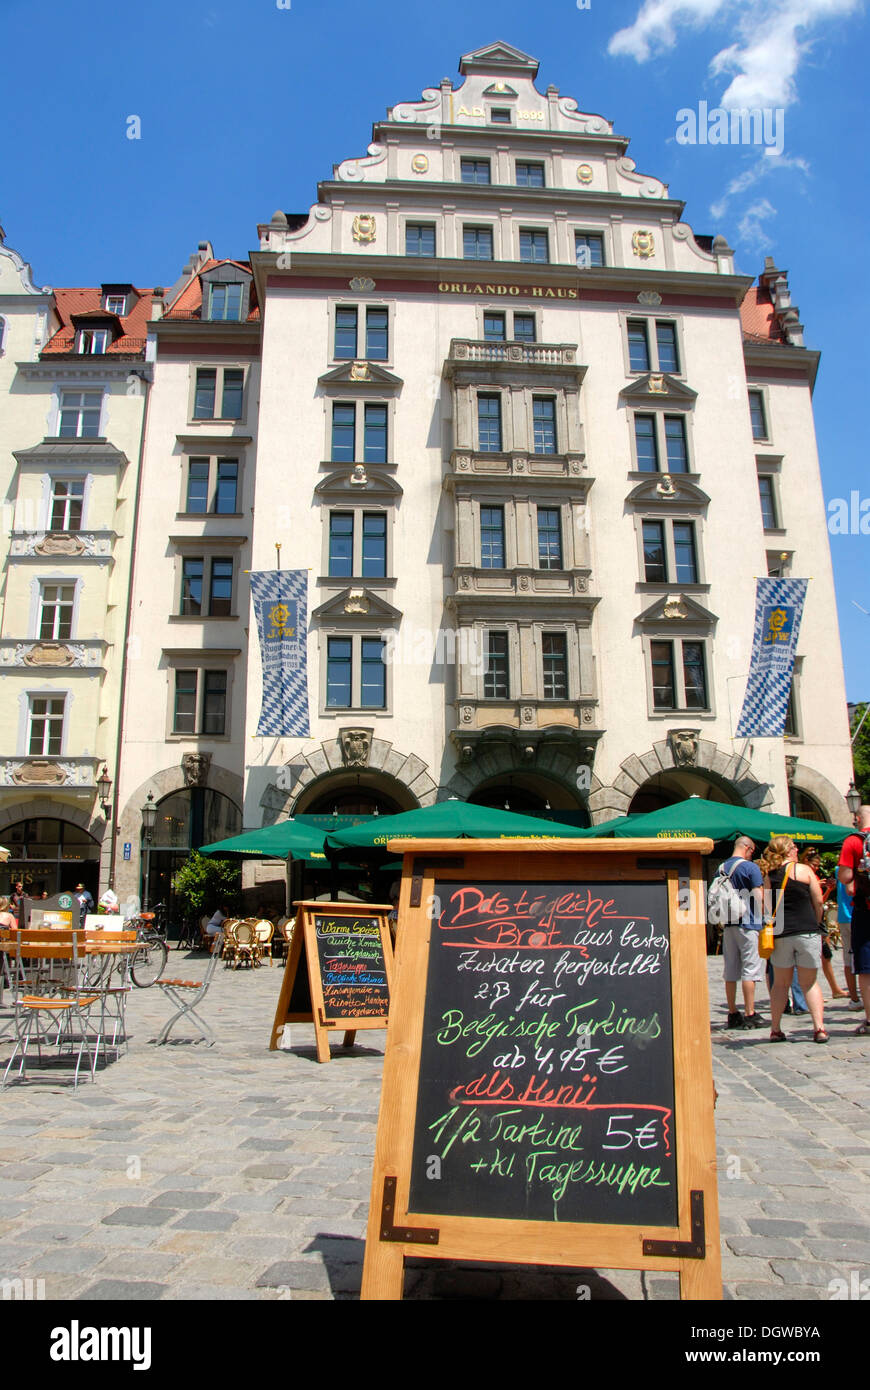 Orlando Haus orlando haus building on the platzl square with restaurant and menu